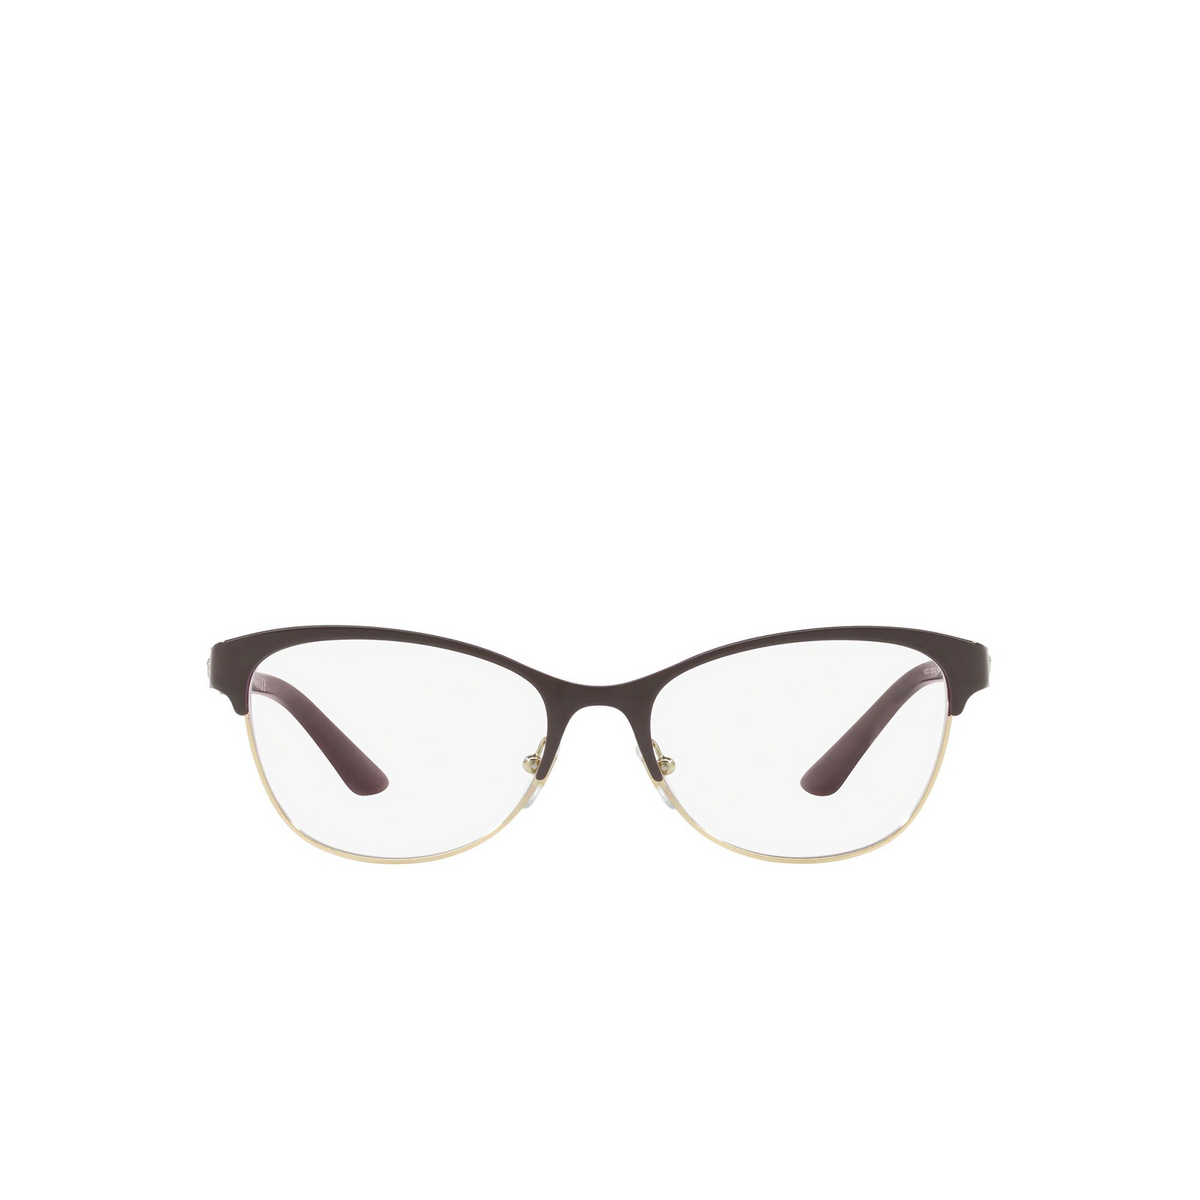 Versace® Cat-eye Eyeglasses: VE1233Q color Violet / Gold 1418 - front view.